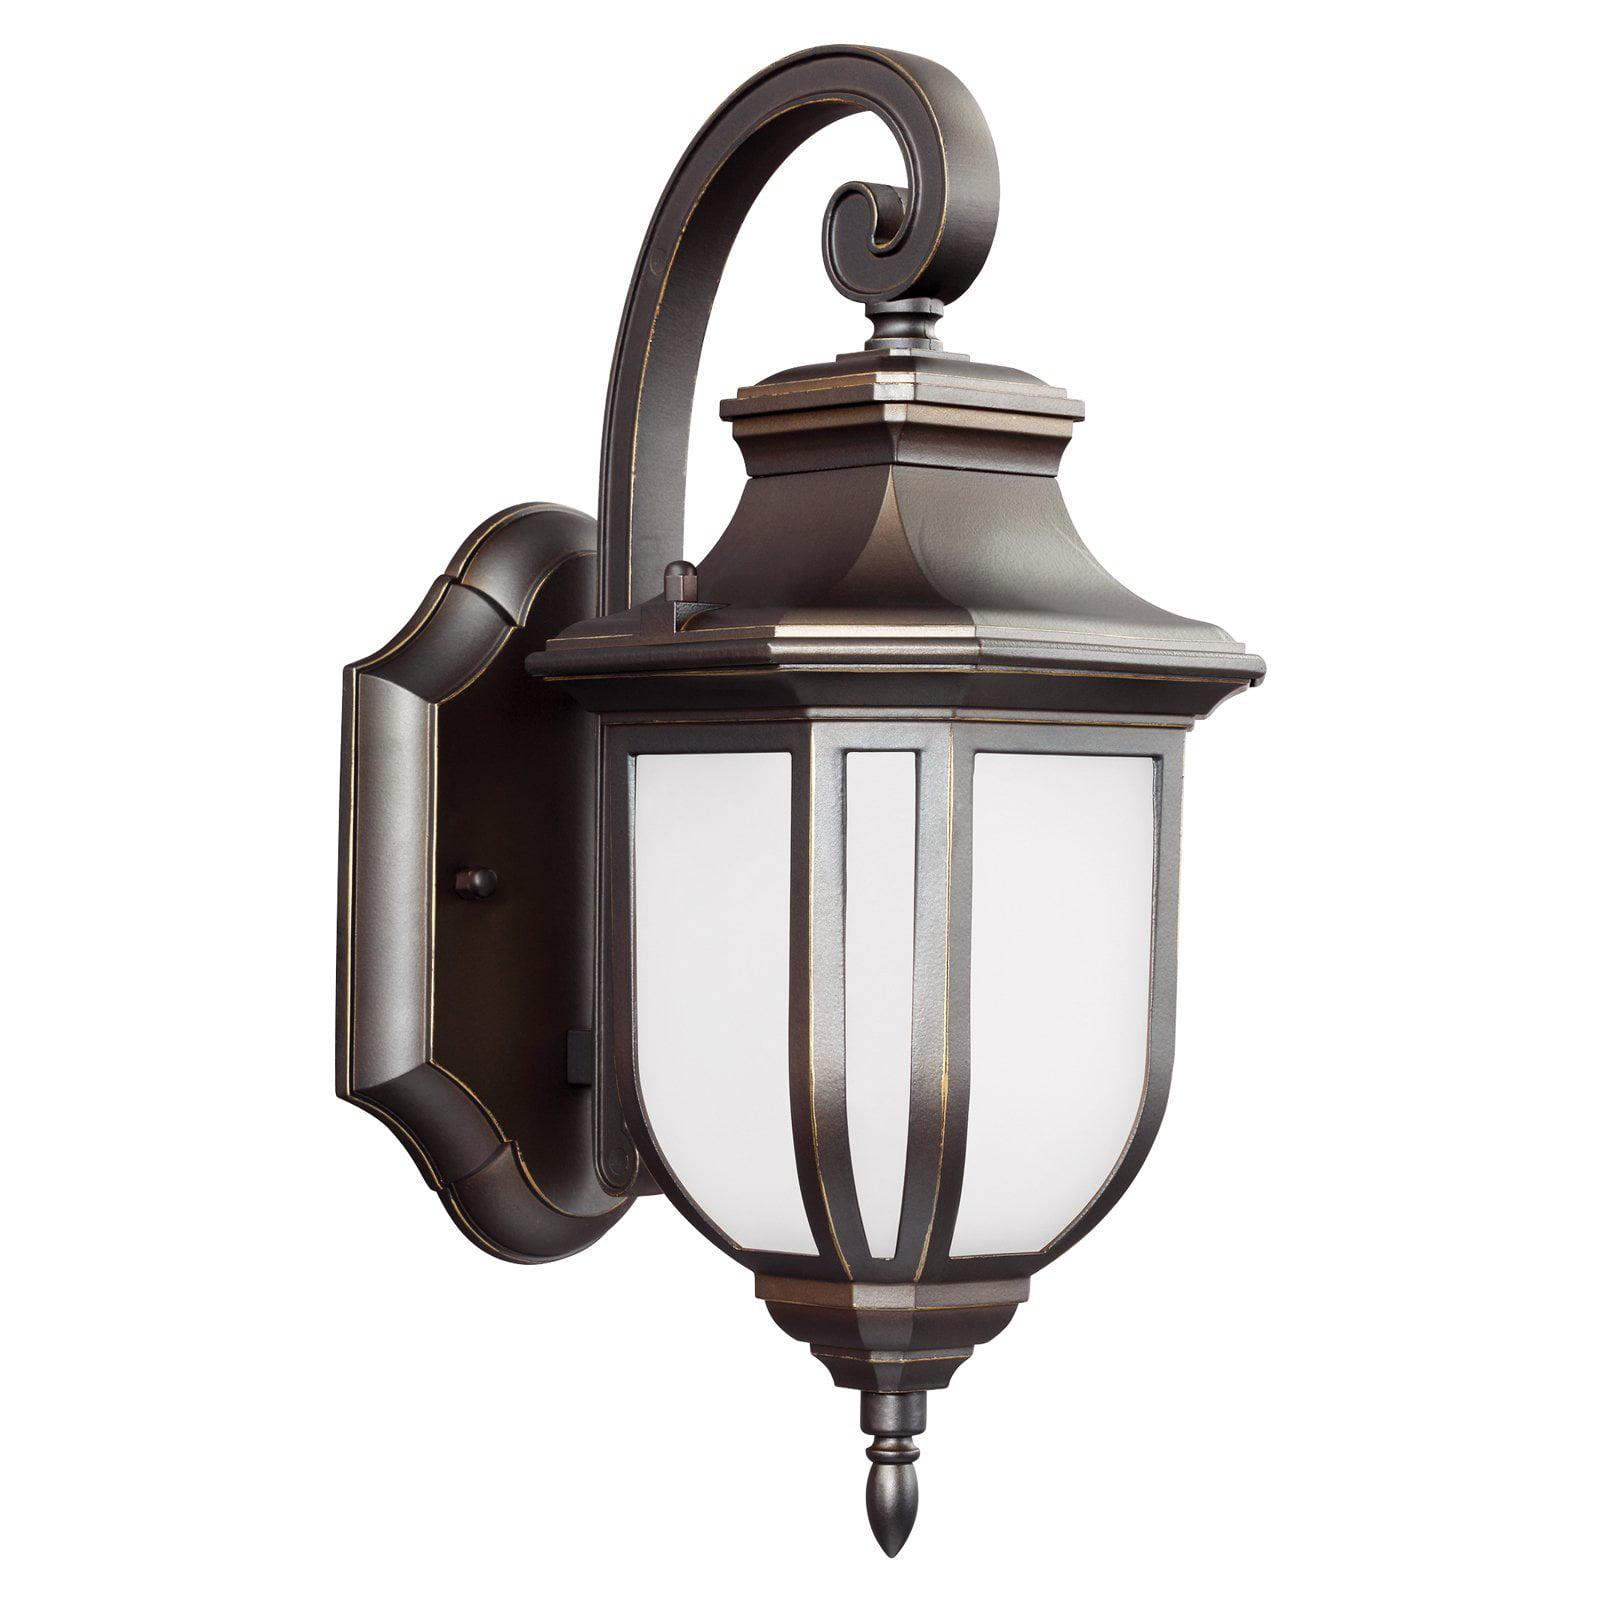 Sea Gull Lighting Childress 8536391S Outdoor Wall Lantern